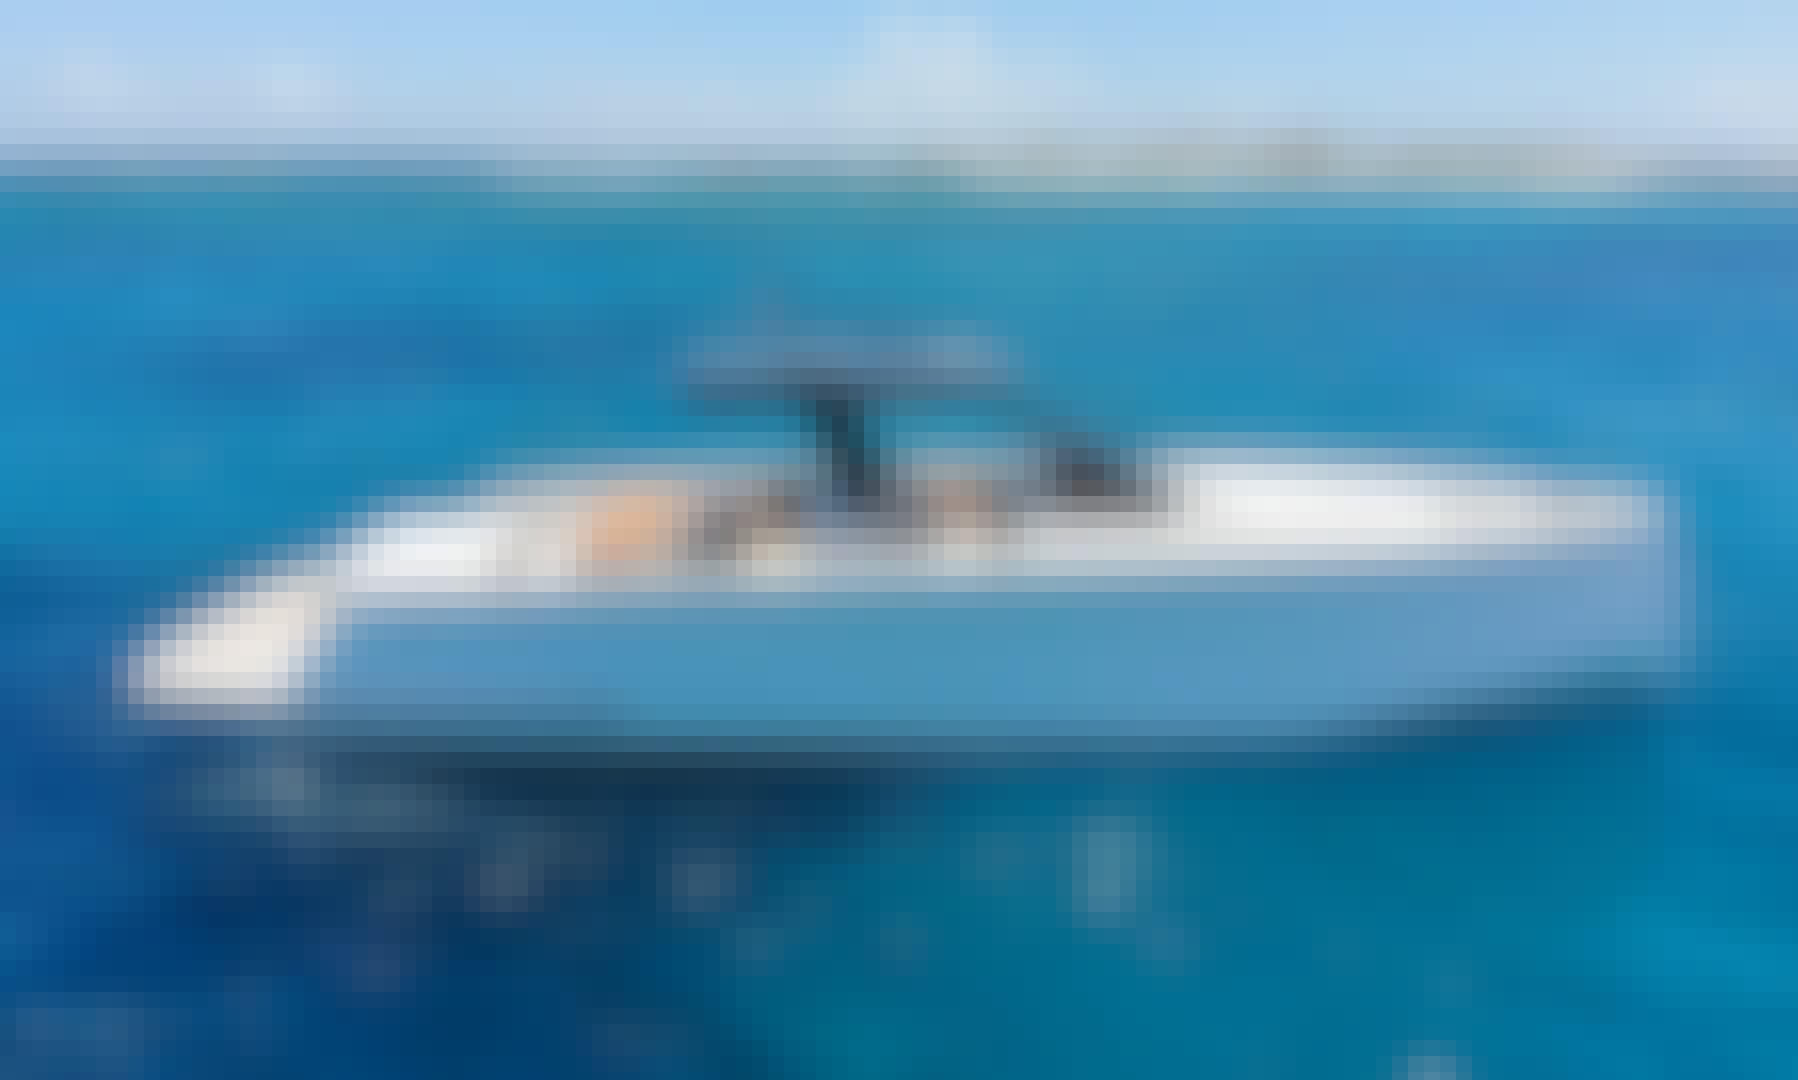 Luxury Yacht Pardo 43' in Sag Harbor, New York